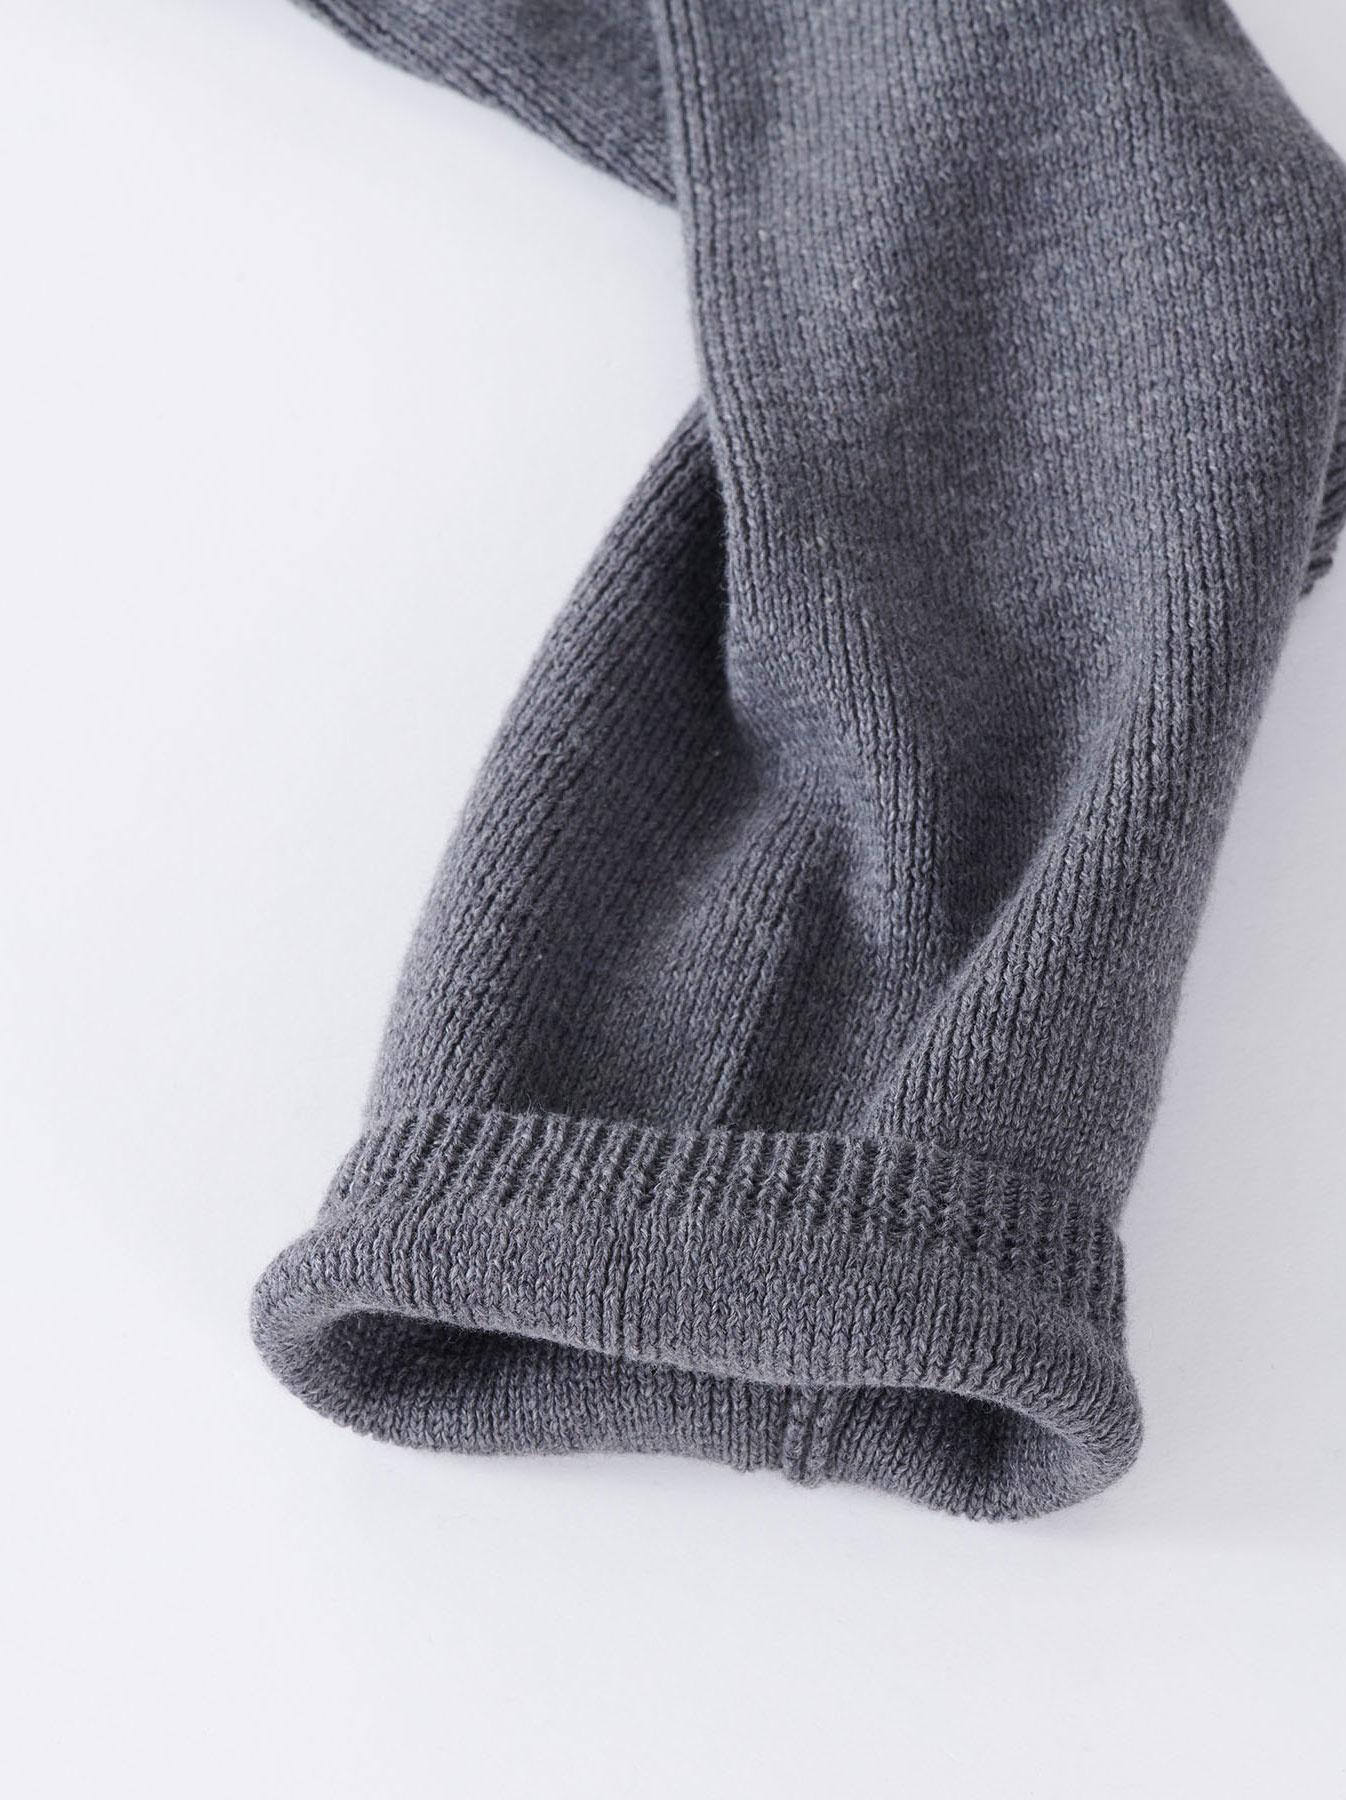 WH Supima Knit-sew Coat-9